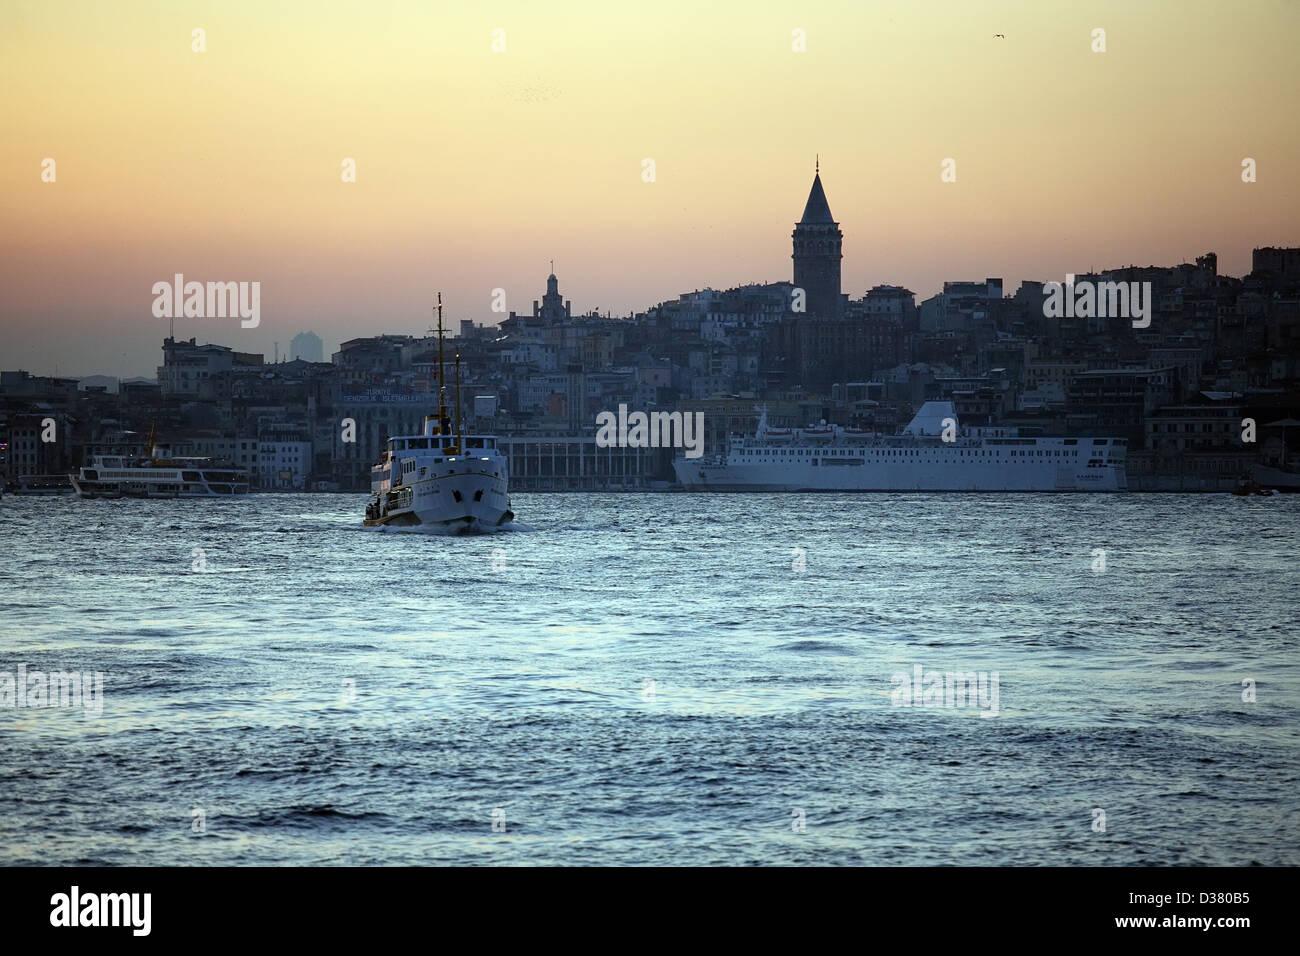 Istanbul, Türkei, Schifffahrt auf dem Bosporus-Meerenge am Ausgang des Goldenen Horns Stockbild